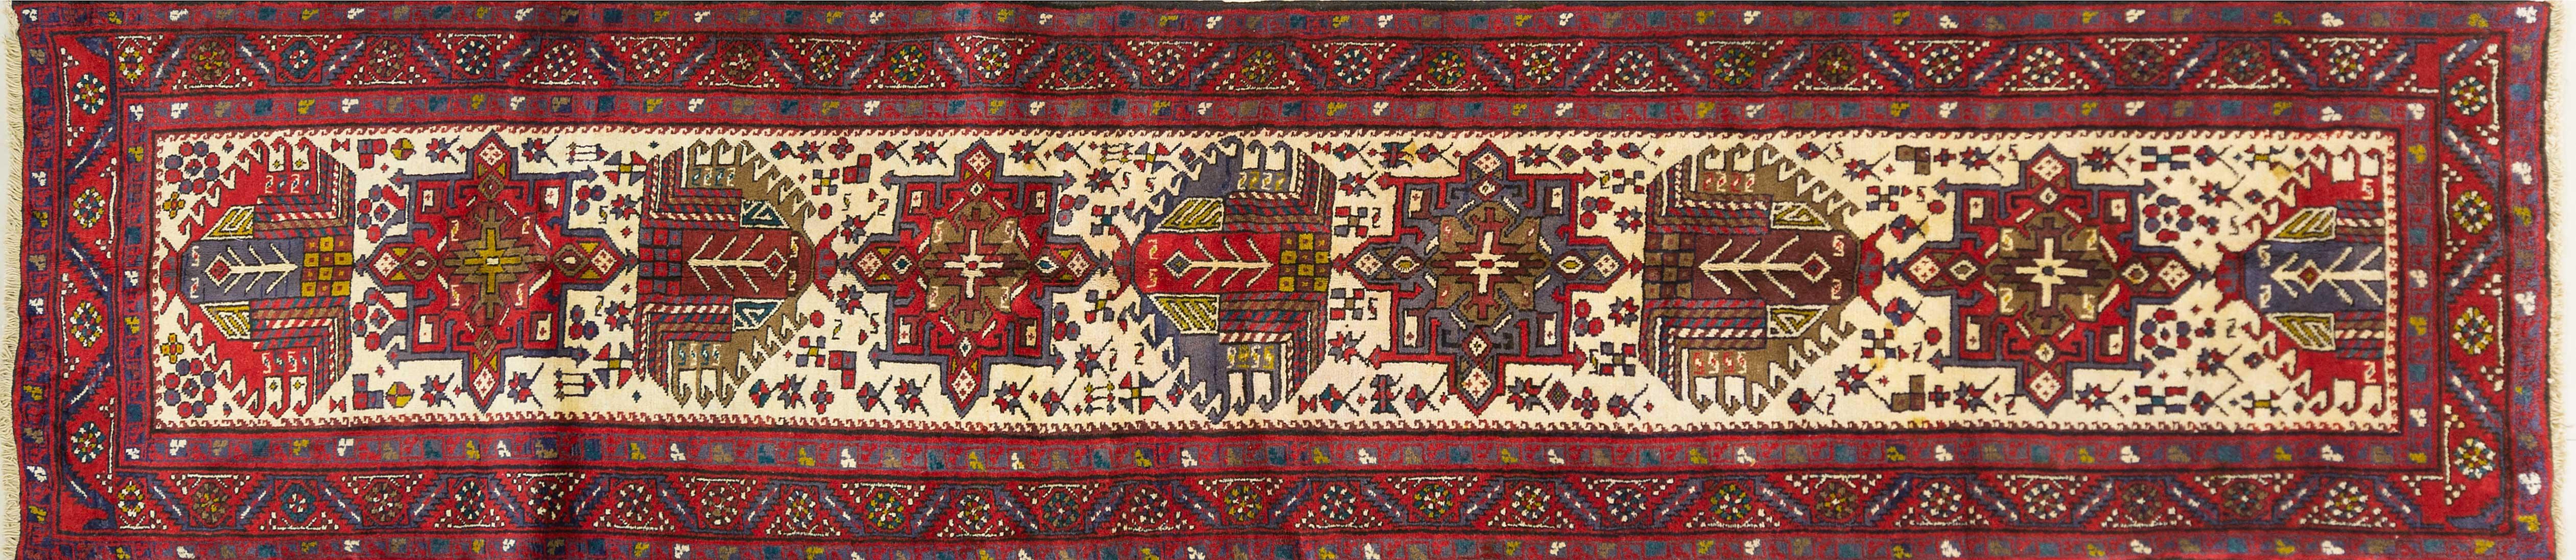 A Persian Hand Knotted Azari Runner, 445 x 92